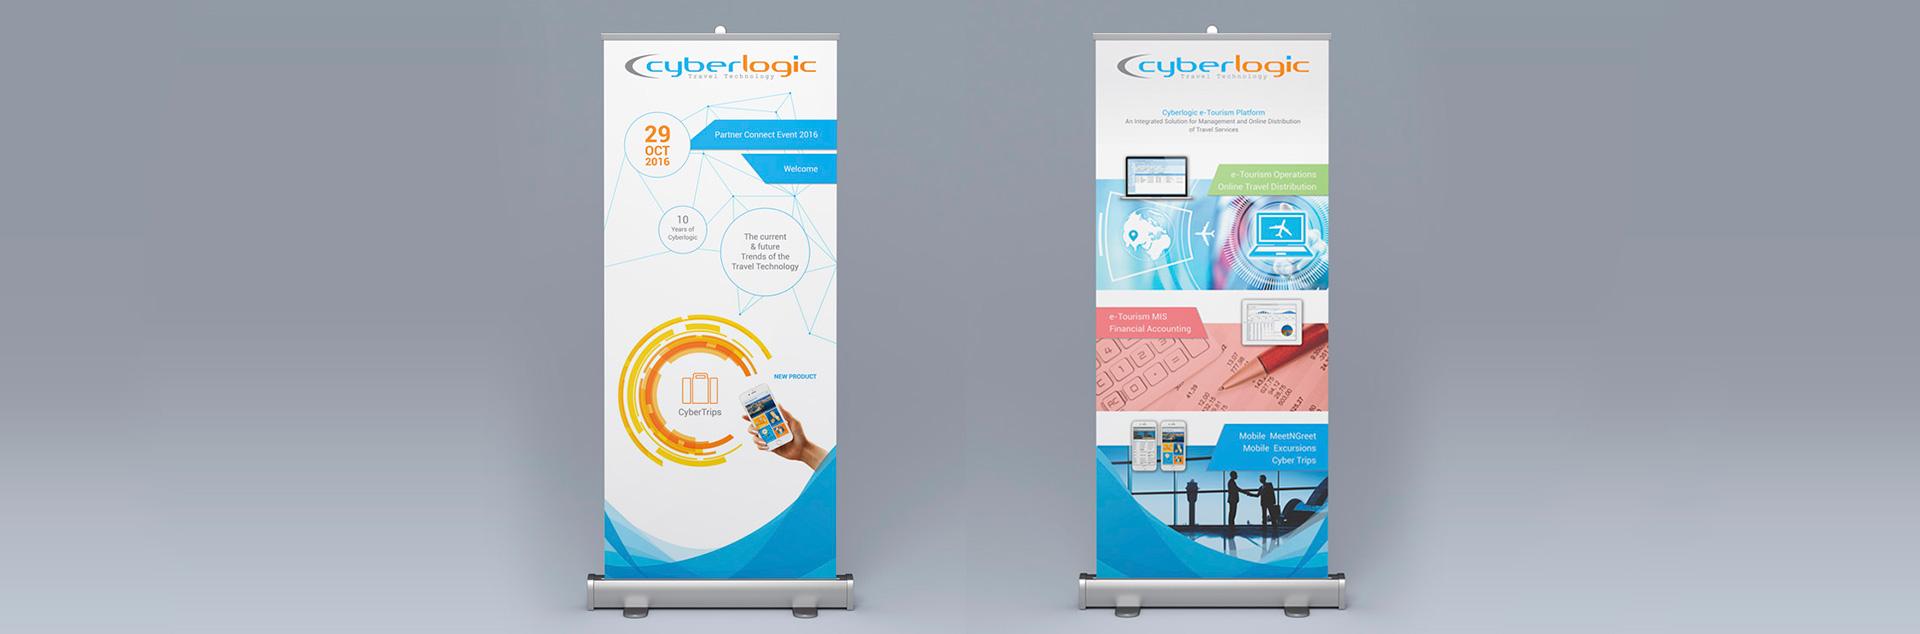 cyberlogic event material